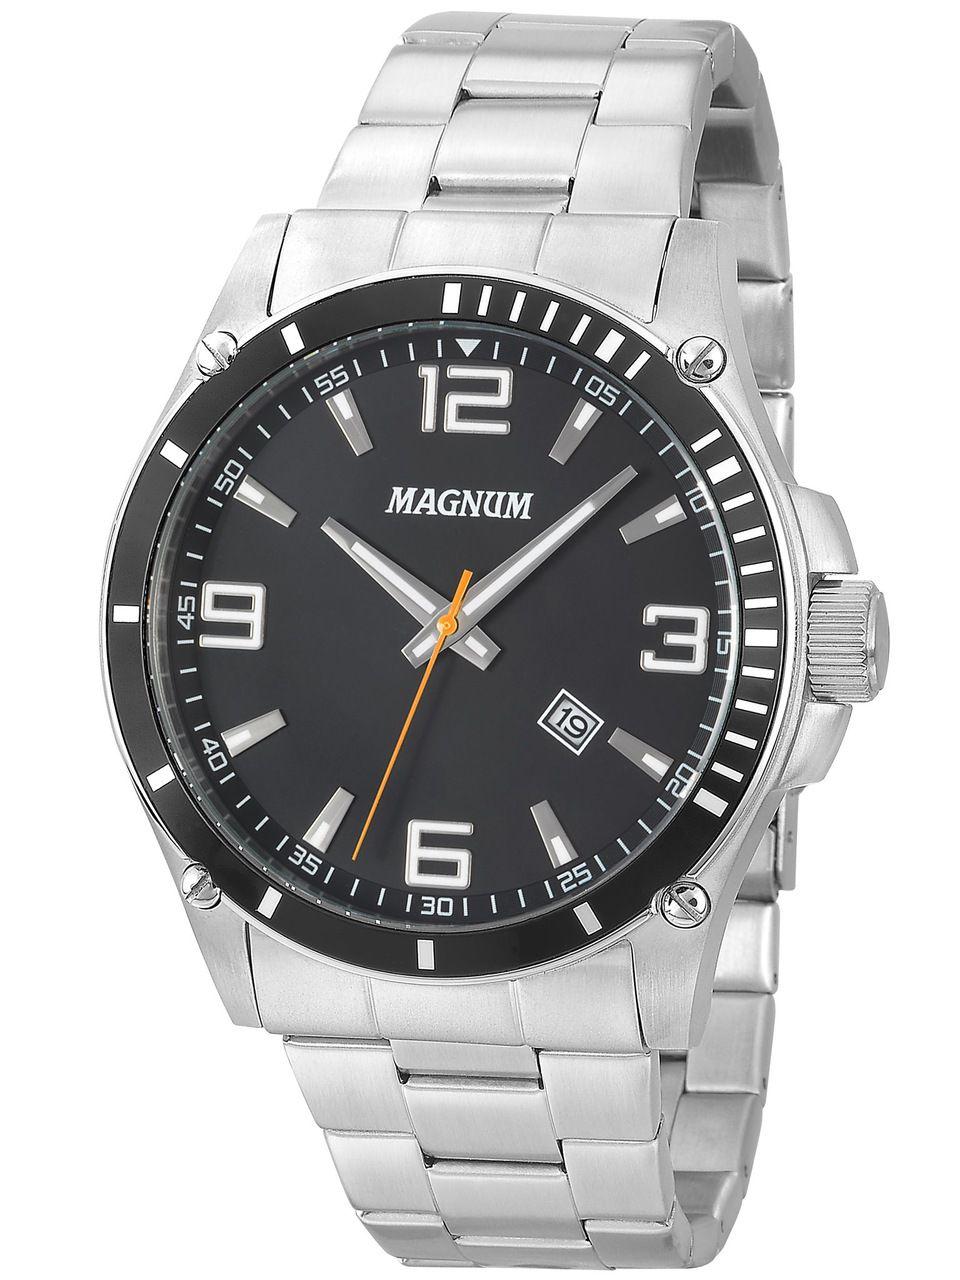 Relógio Magnum Ma34638t Masculino Prata com Fundo Preto